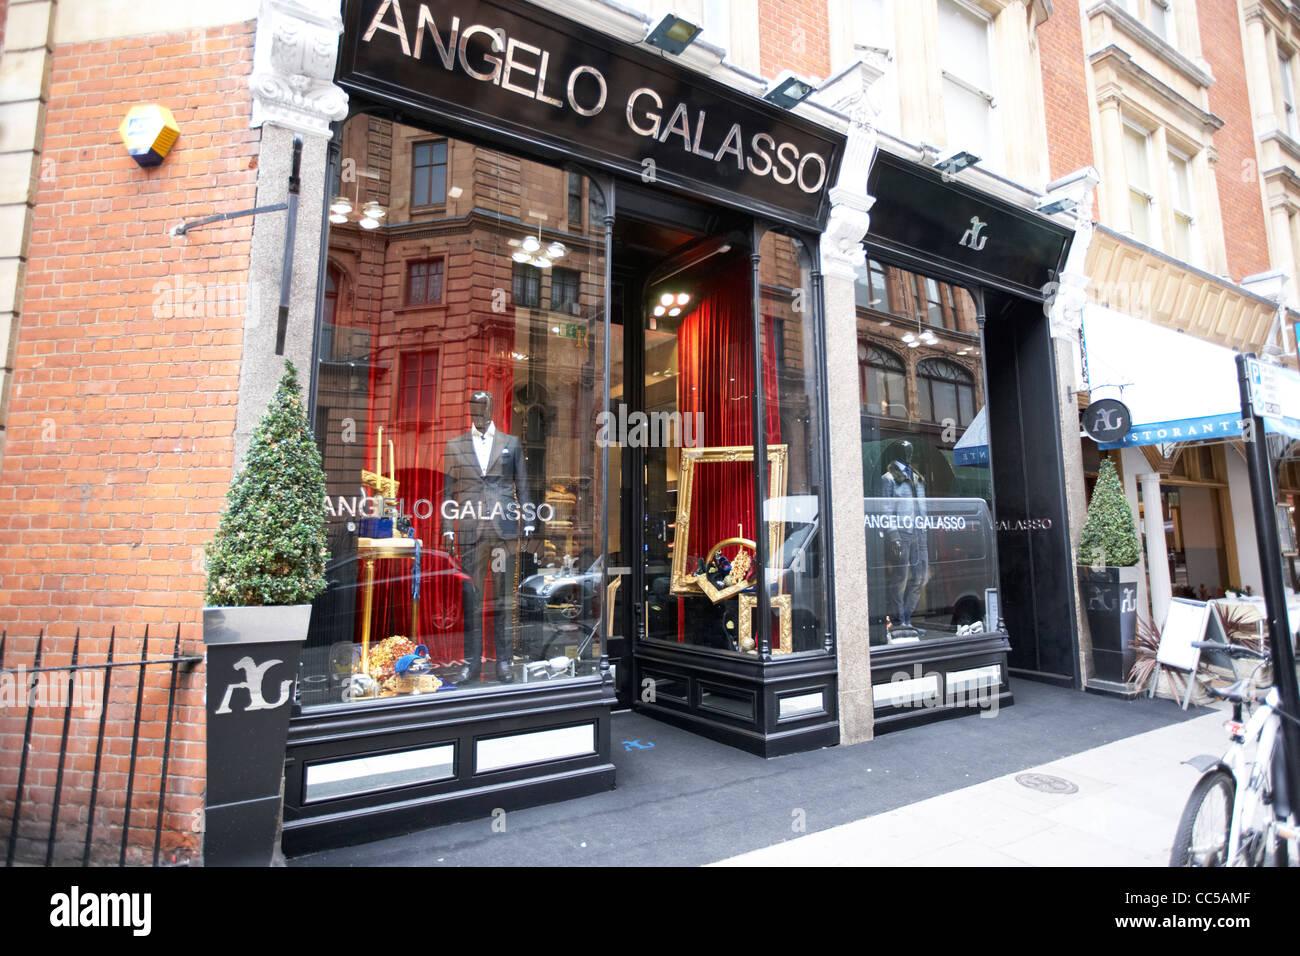 finest selection 7702f 25cb7 Angelo galasso stilista italiano shop store in Knightsbridge ...